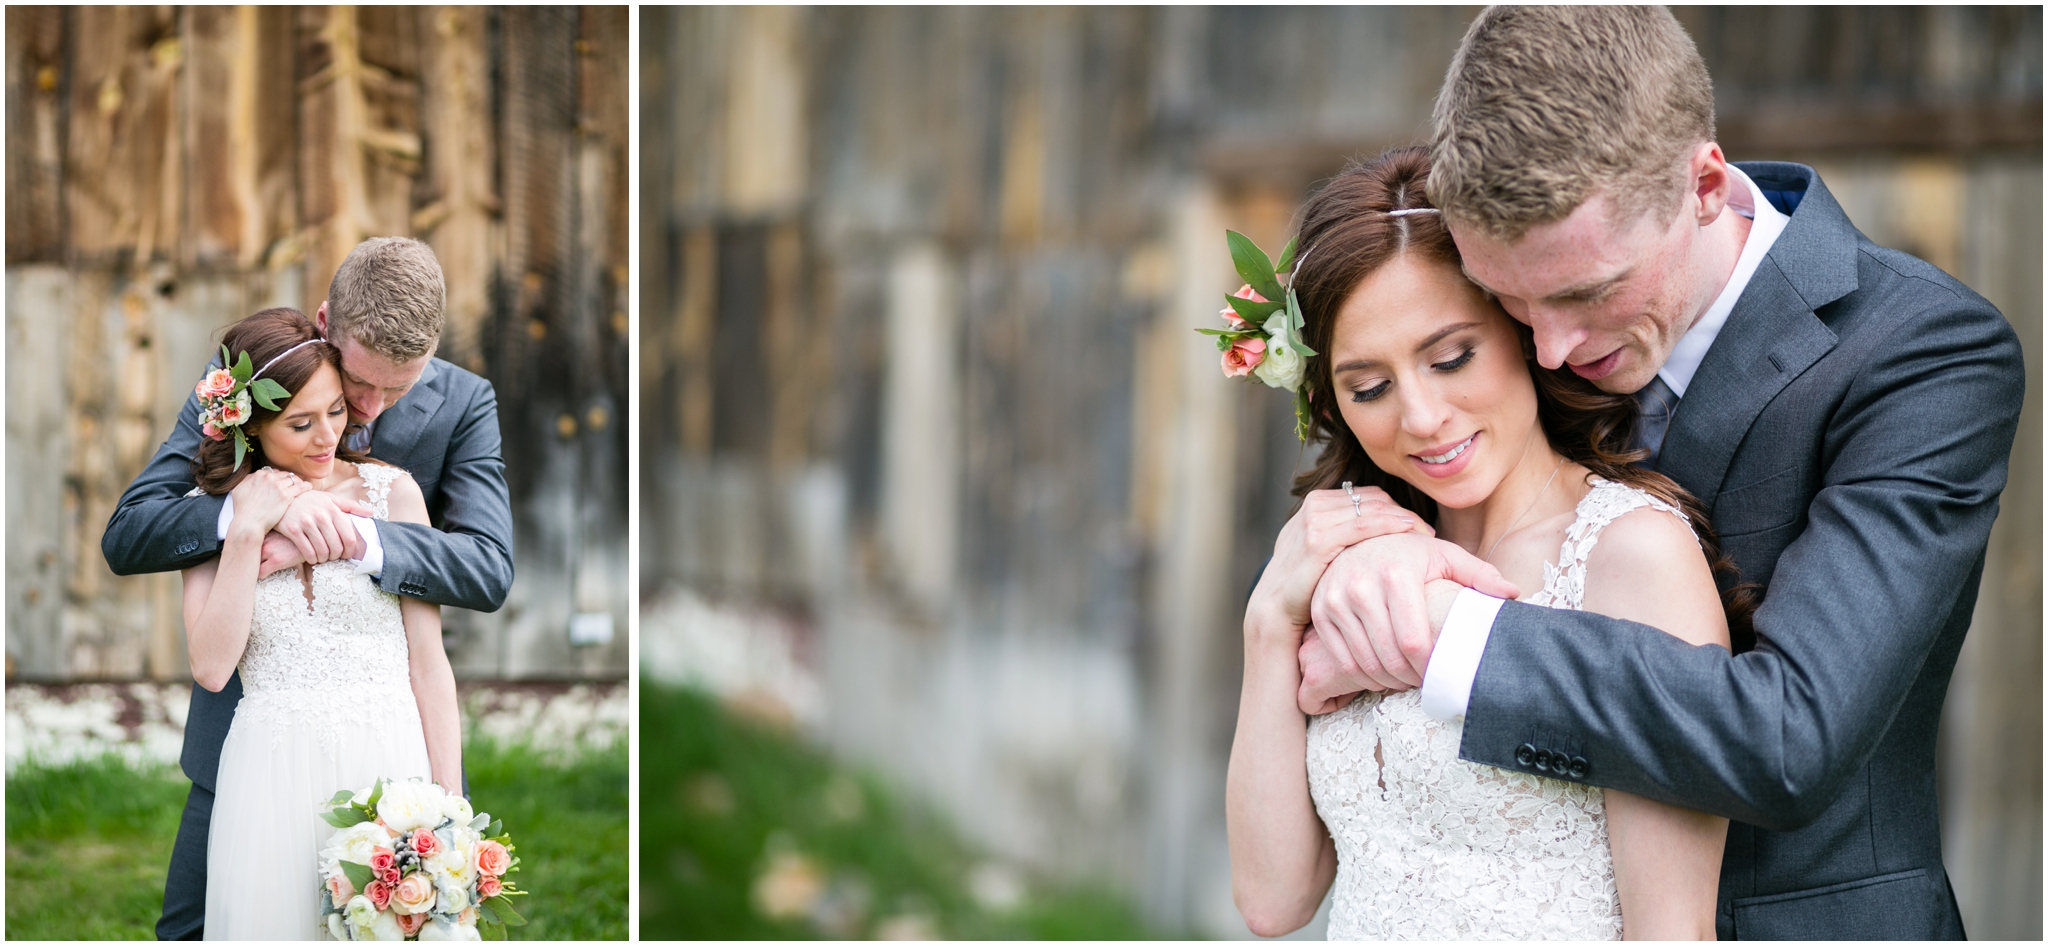 Evergreen_Wedding_Photographers_Bride_Groom.JPG